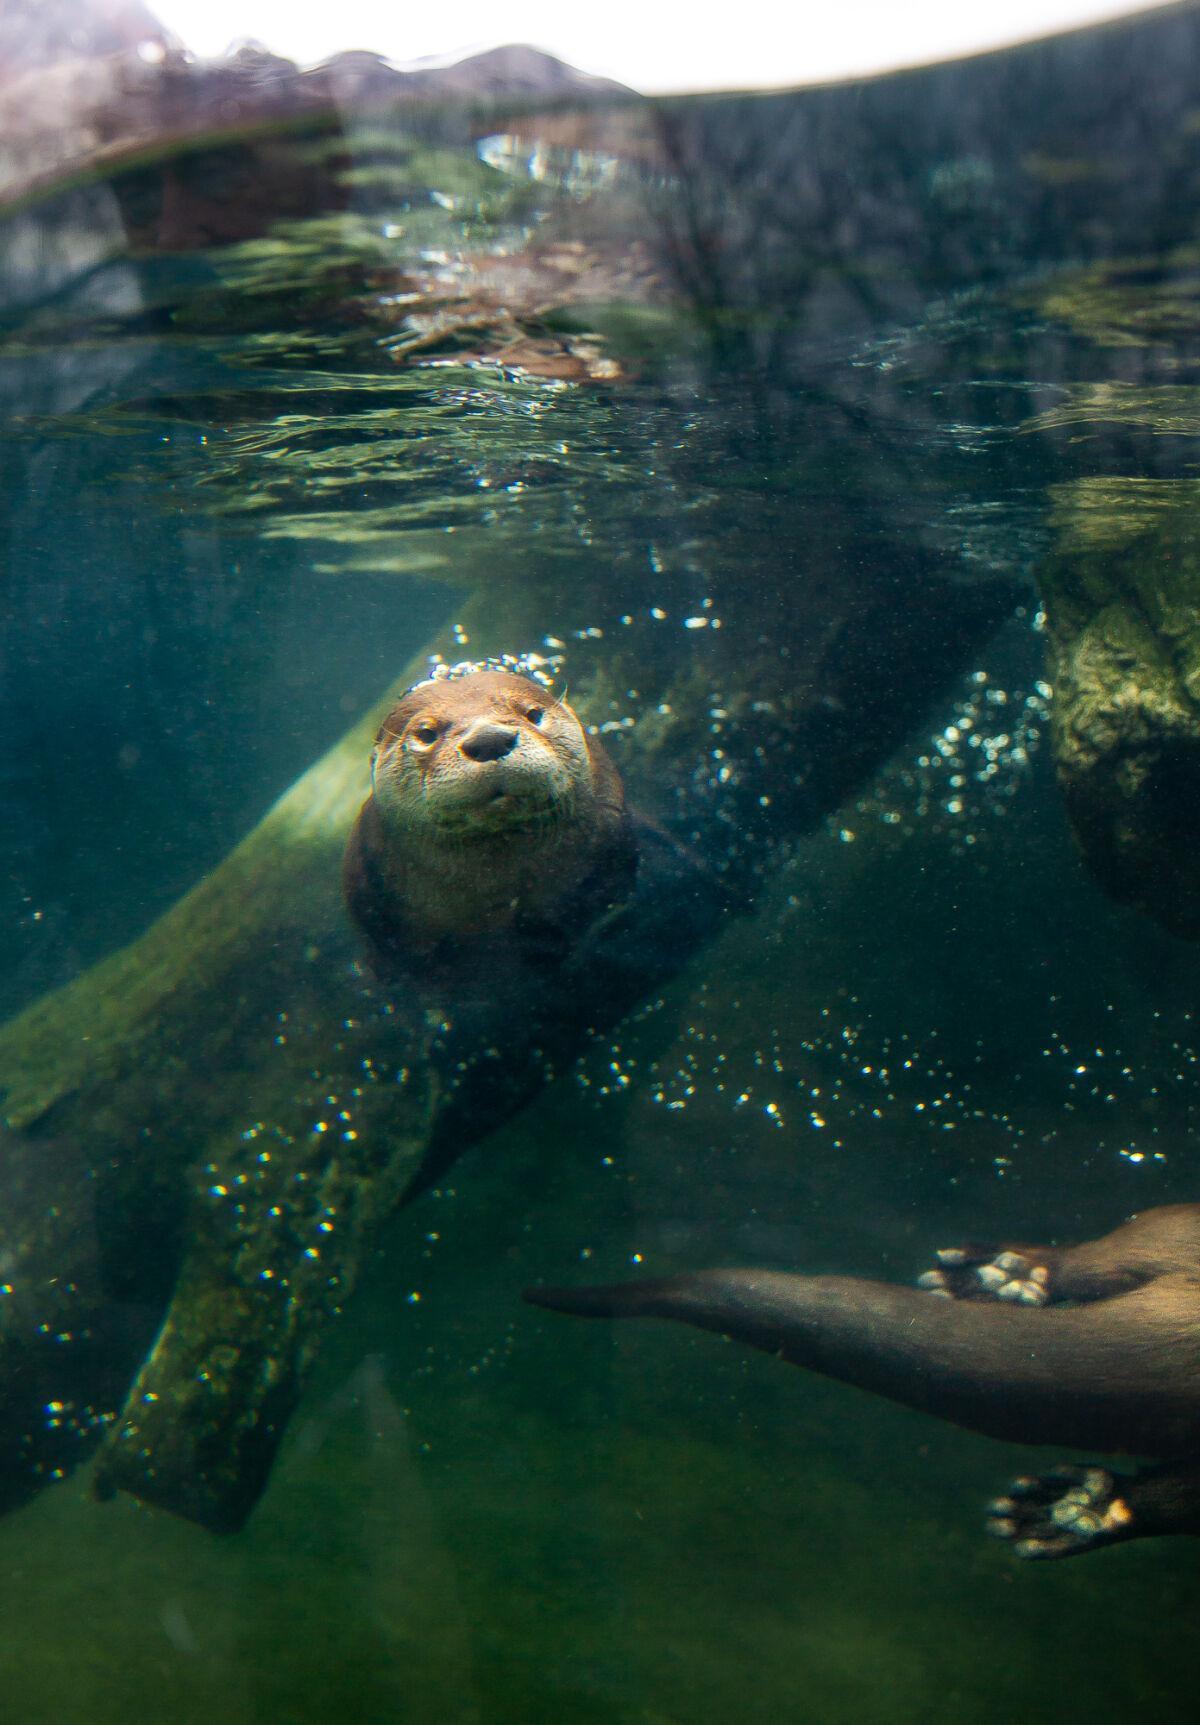 Zoo New York kicks off 100th year on Saturday